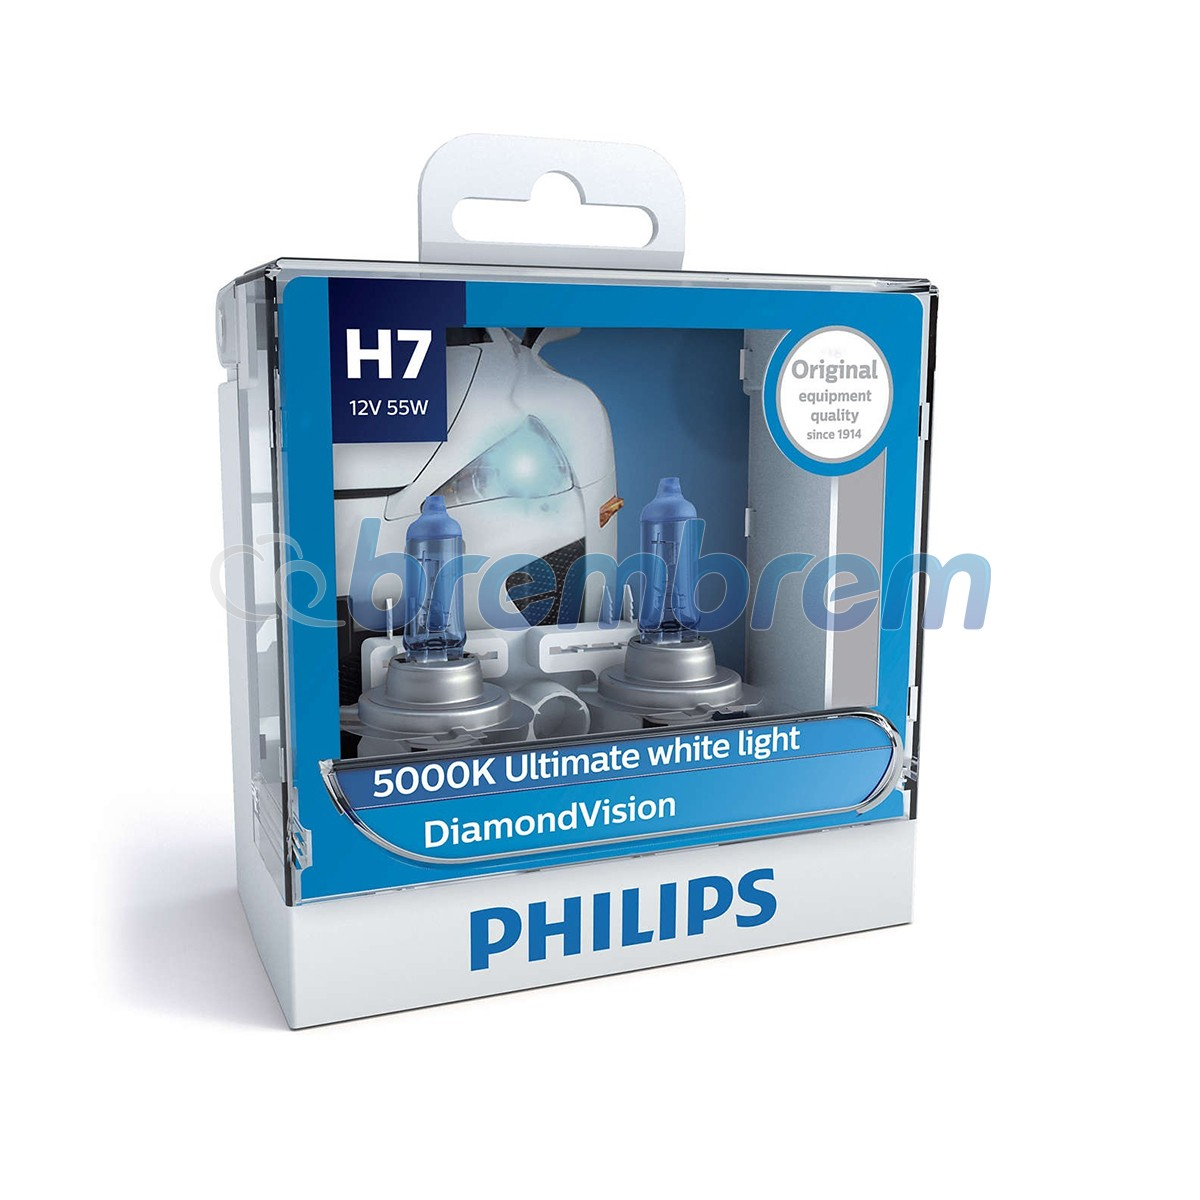 PHILIPS DIAMOND VISION H7 (5000K) - LAMPU HALOGEN